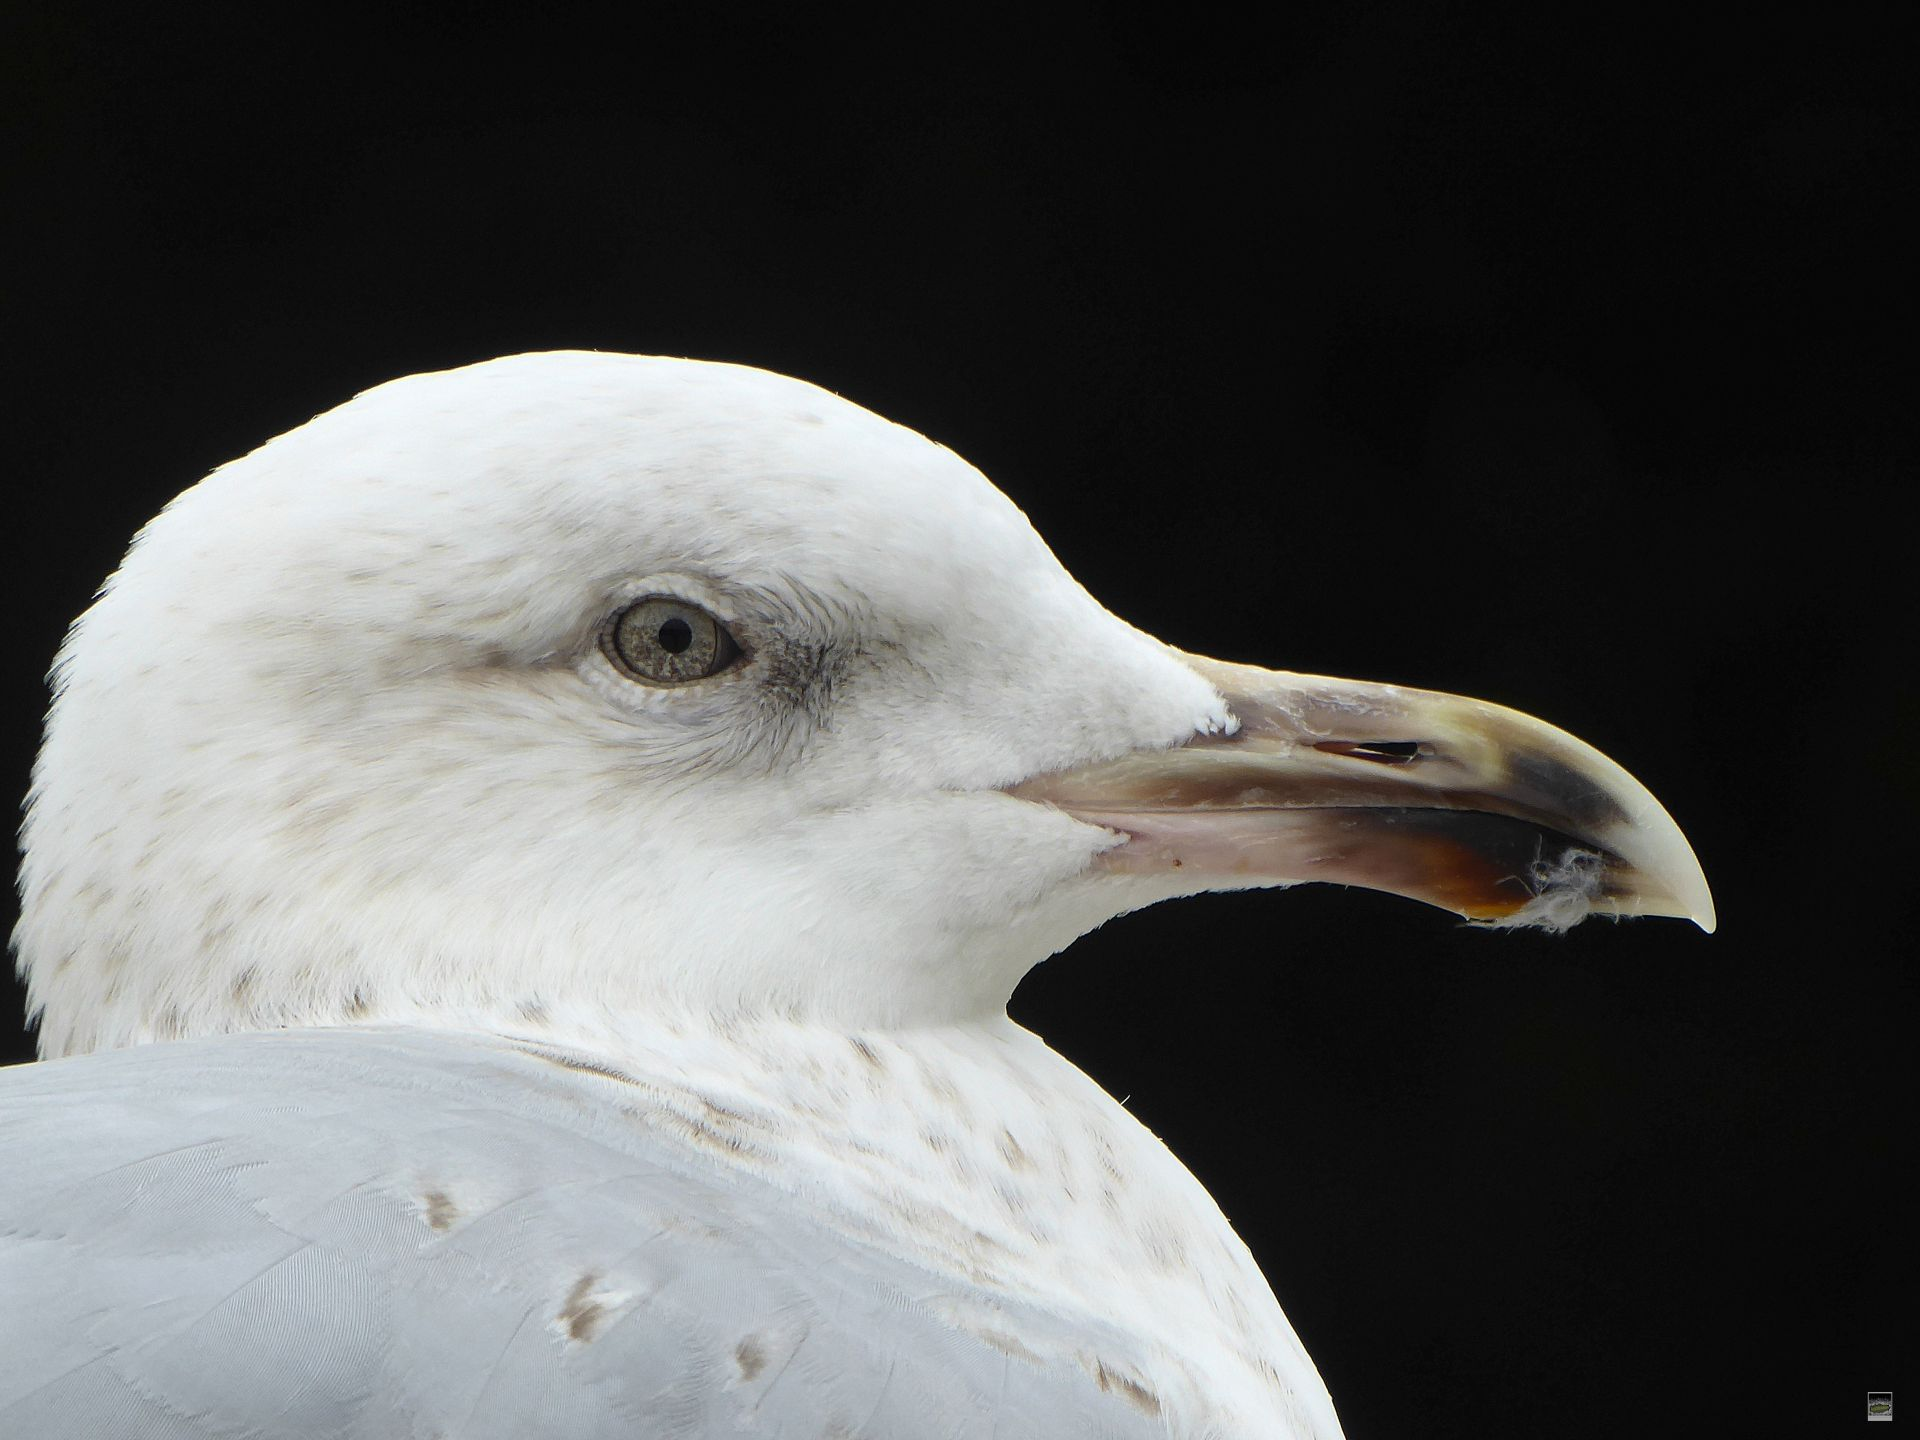 Fotografin: Hedwig Wantia